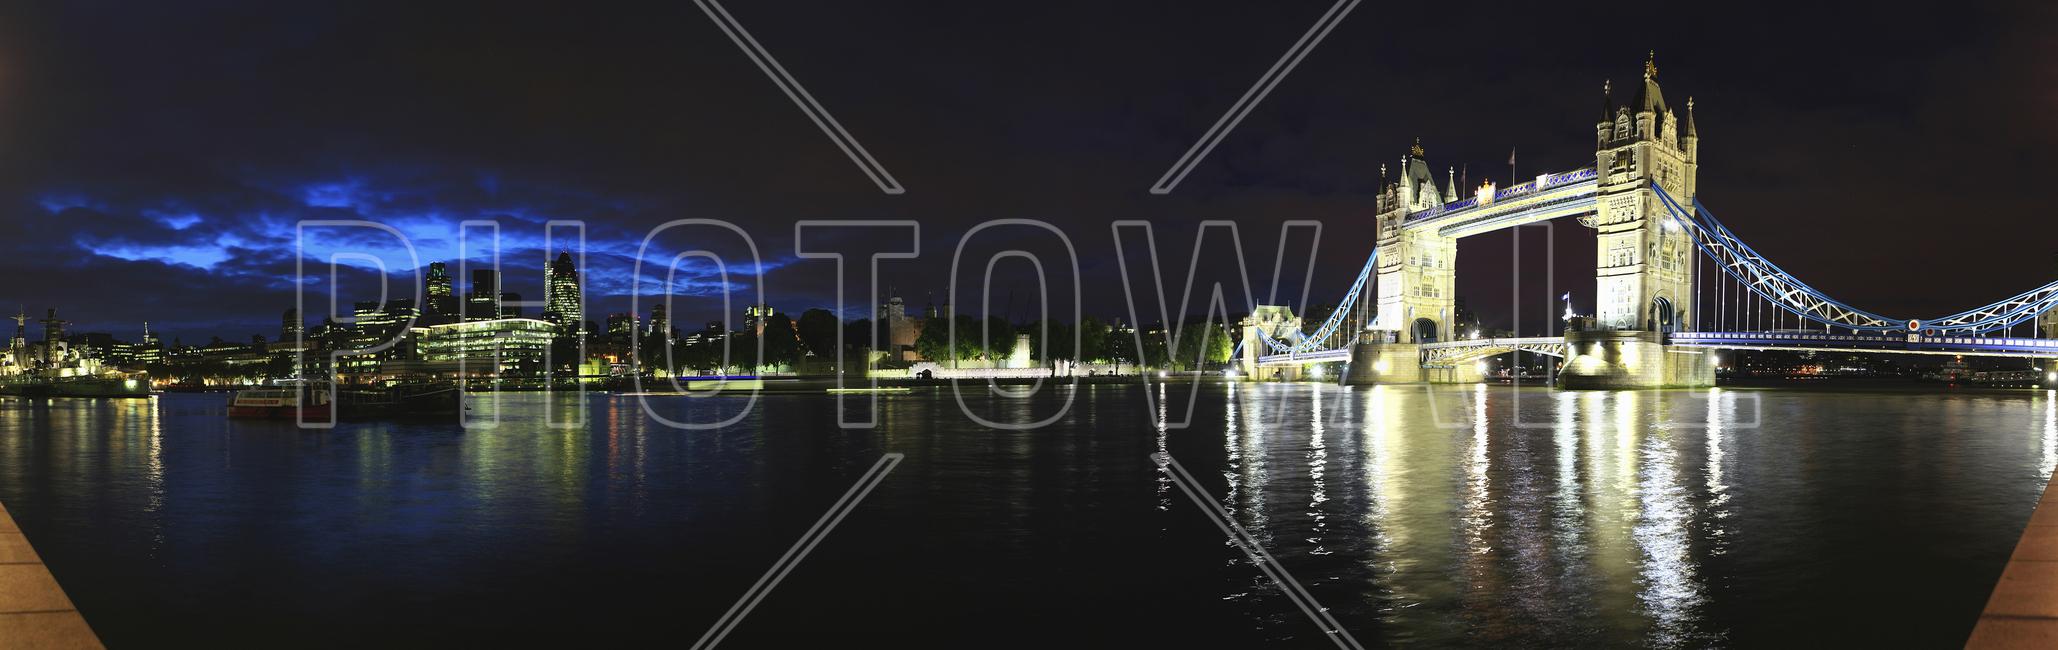 london tower bridge at night wall mural photo wallpaper london tower bridge at night